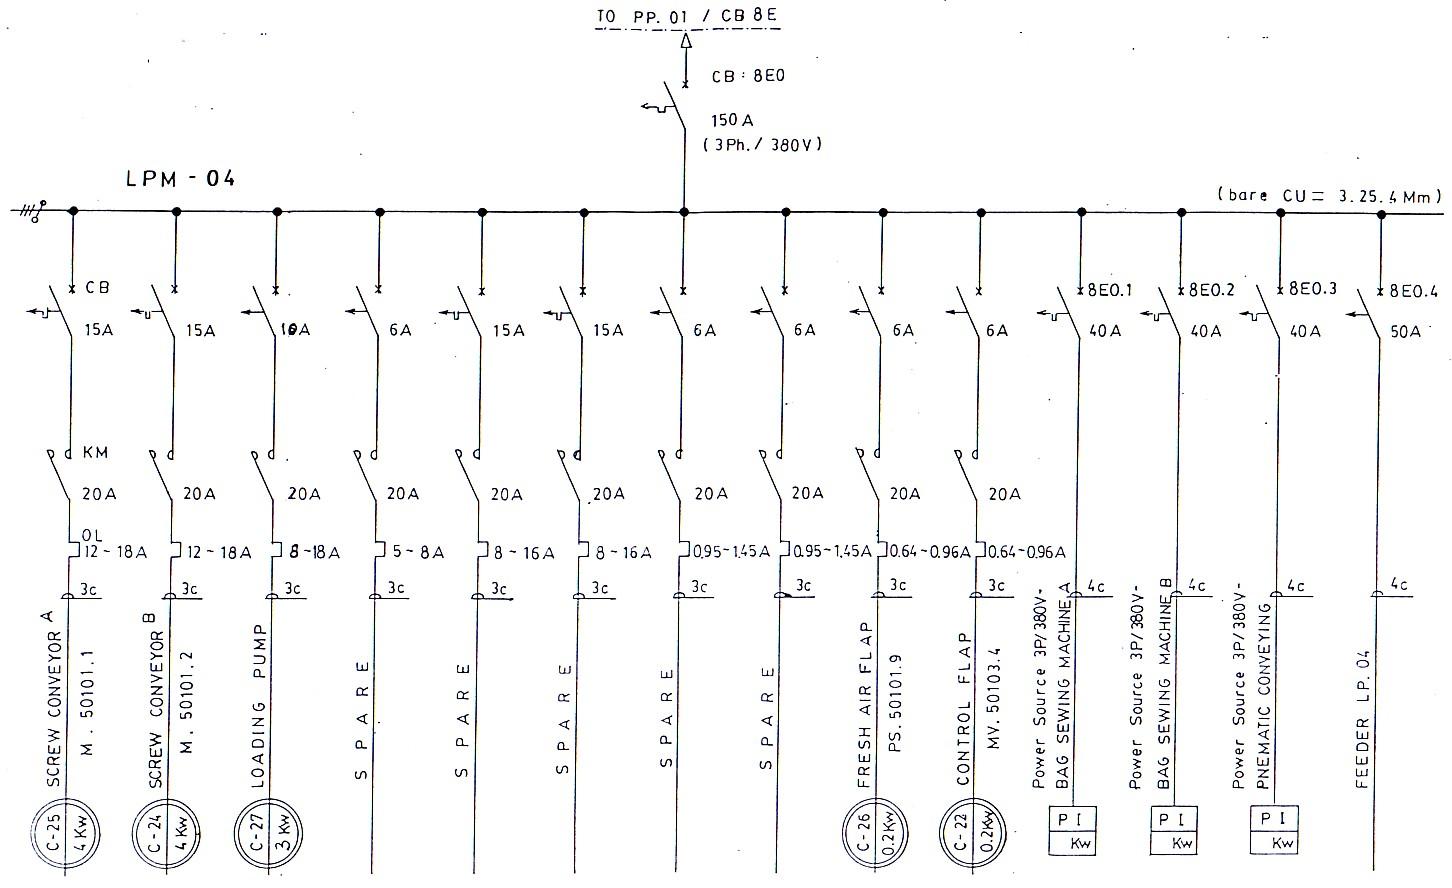 gambar single line diagram gambar image wiring diagram simbol wiring diagram listrik simbol image wiring on gambar single line diagram